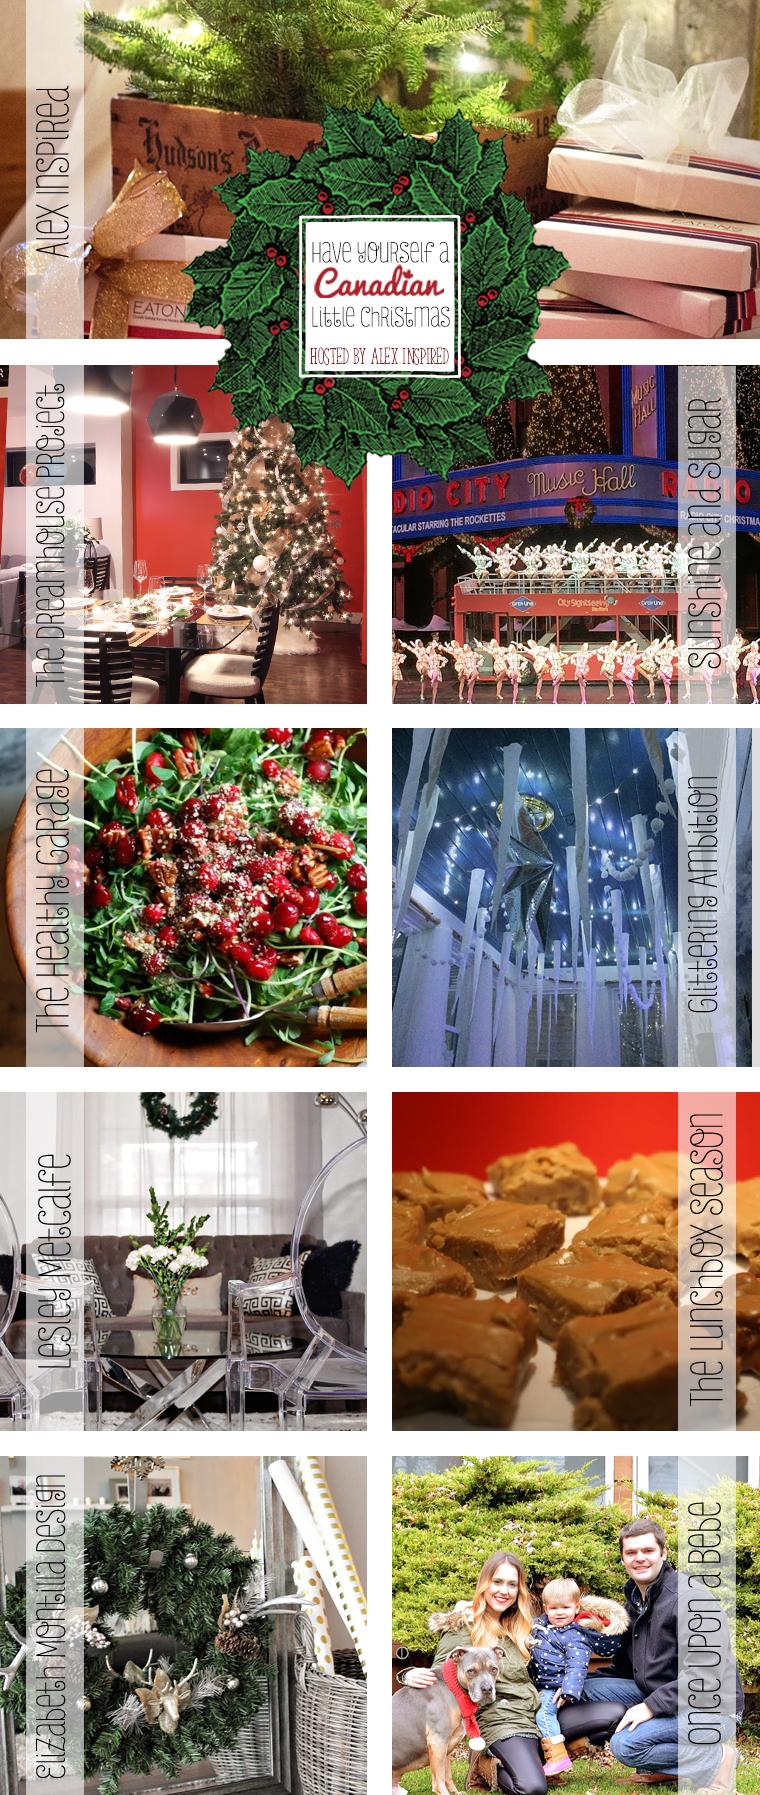 composite-final-canadian-little-christmas